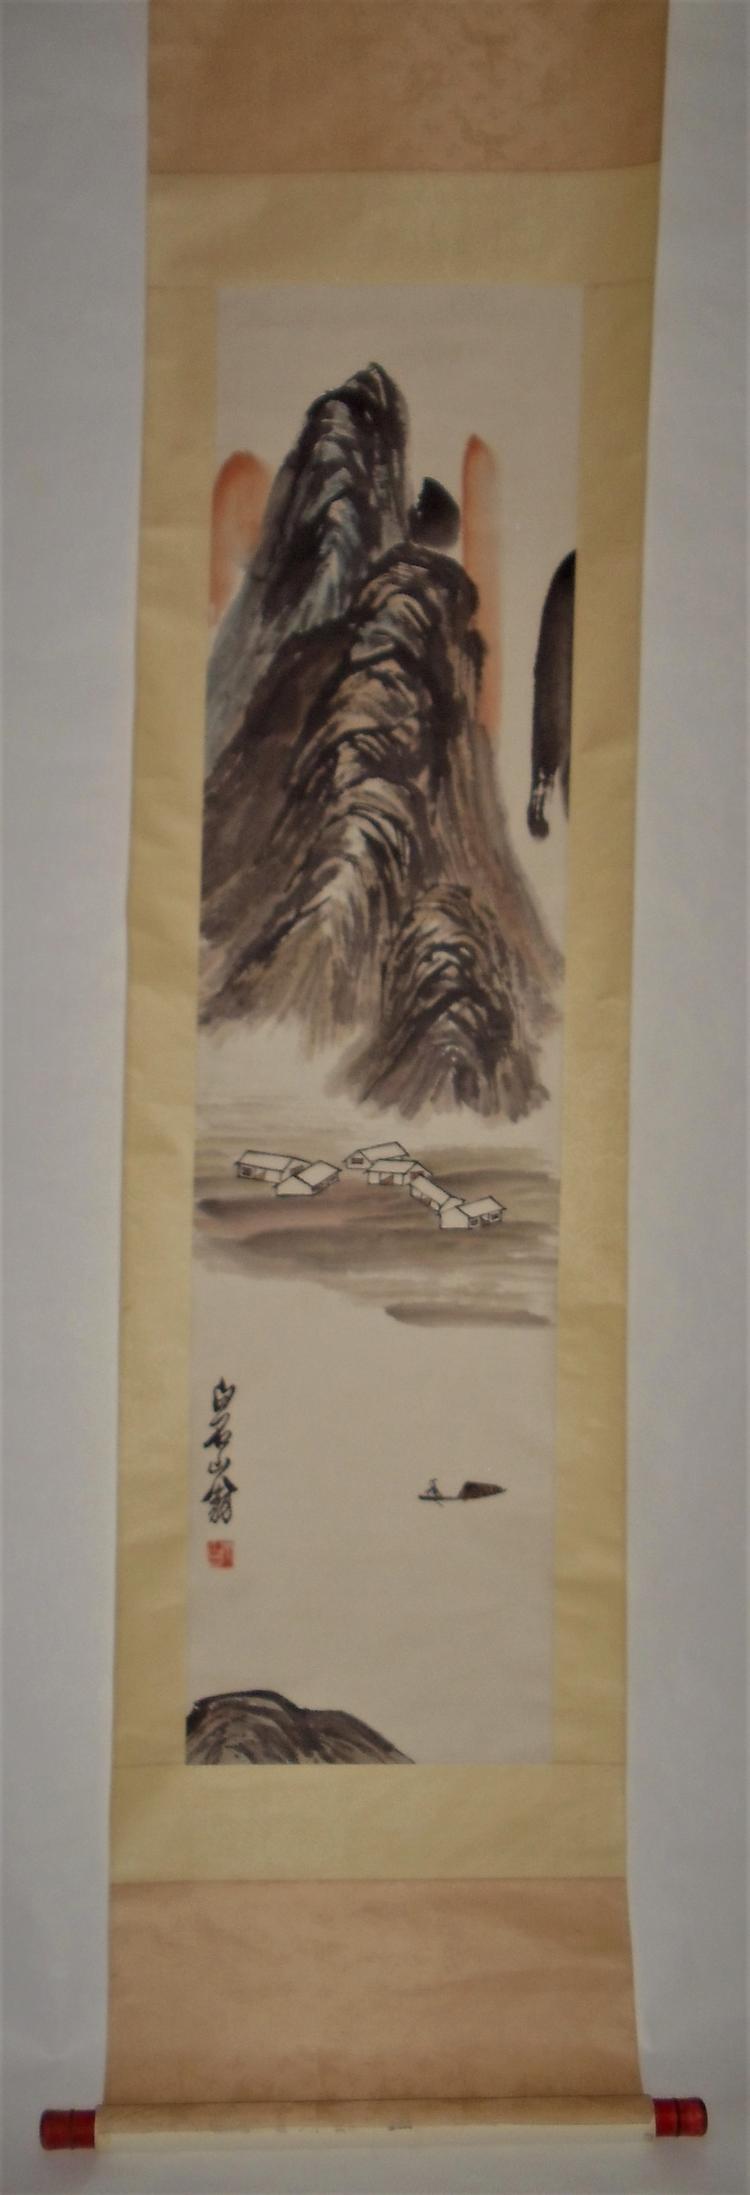 Qi Baishi (1864-1957) / Life at the Foot of a Towering Mountain